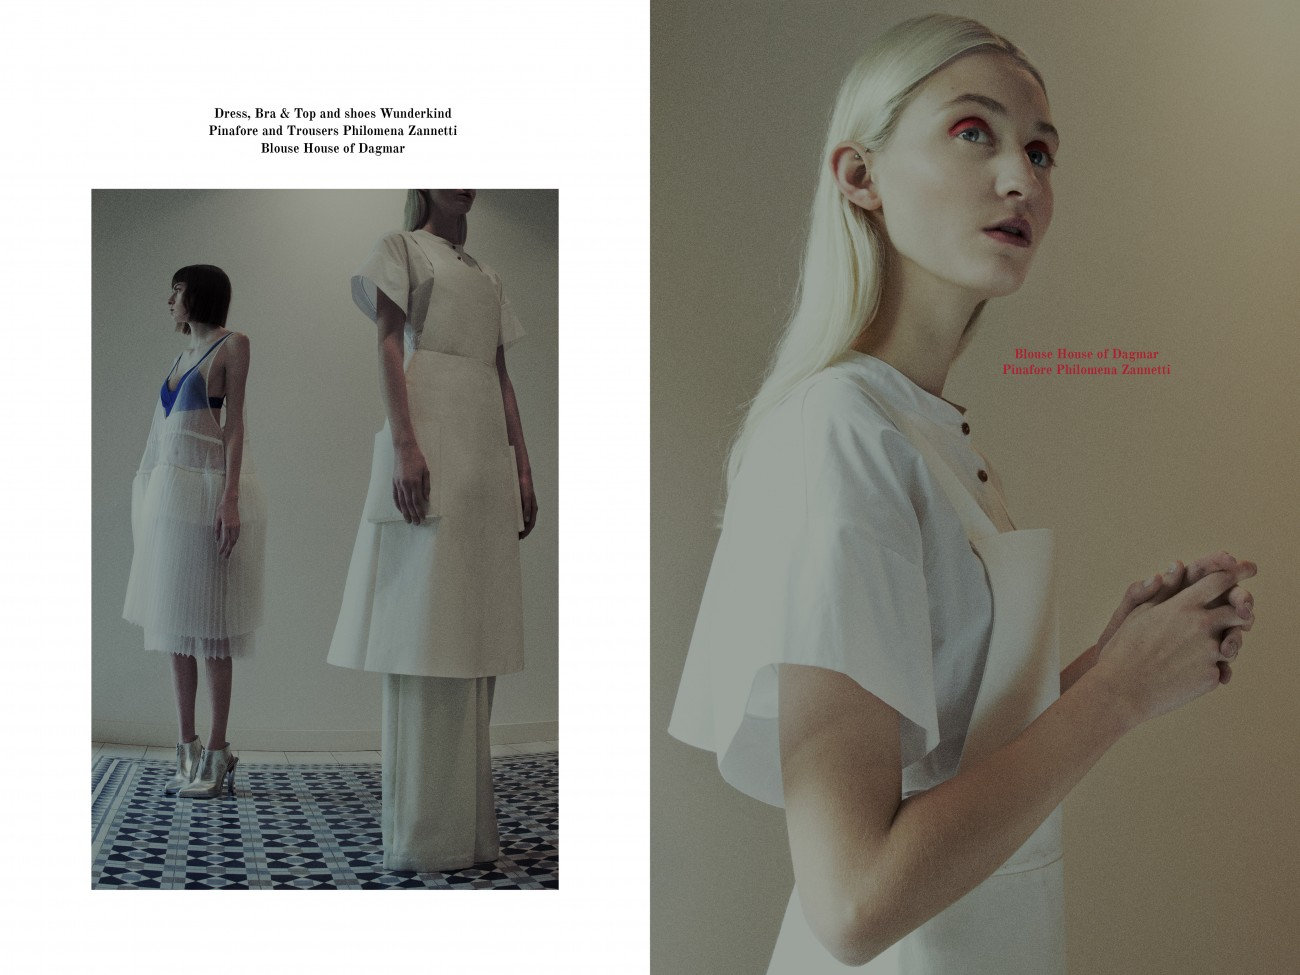 Loreen-Hinz-I-Cannot-Tell-My-Secrets-OE-Magazine03